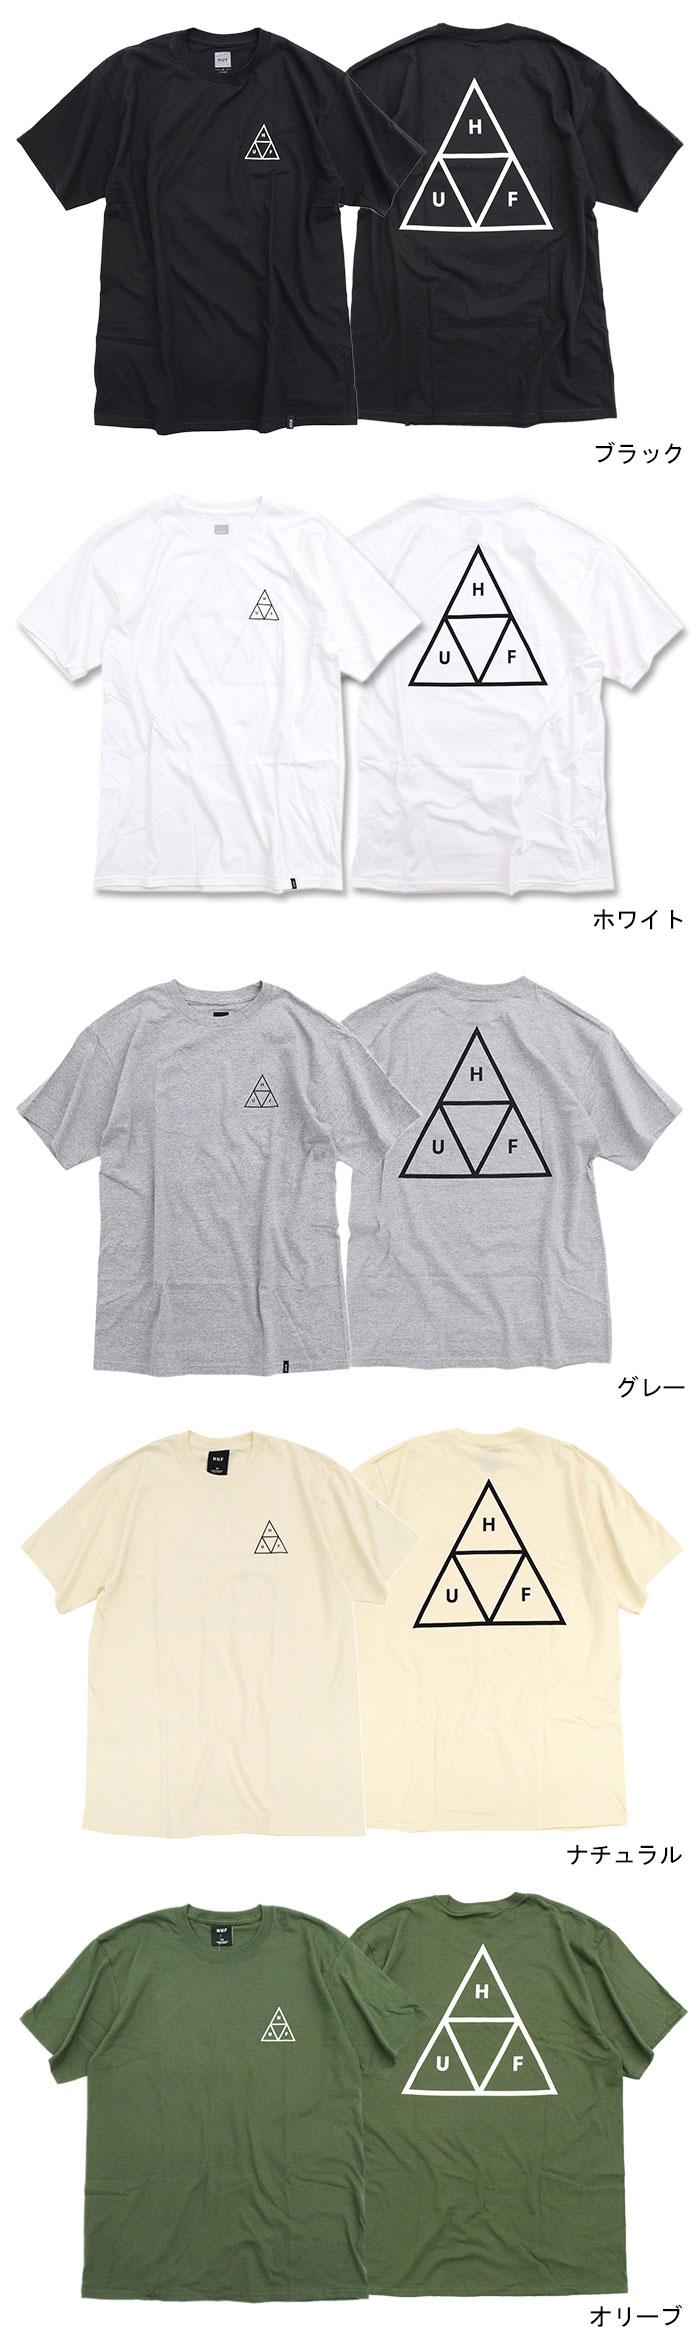 HUFハフのTシャツ Essentials Triple Triangle07